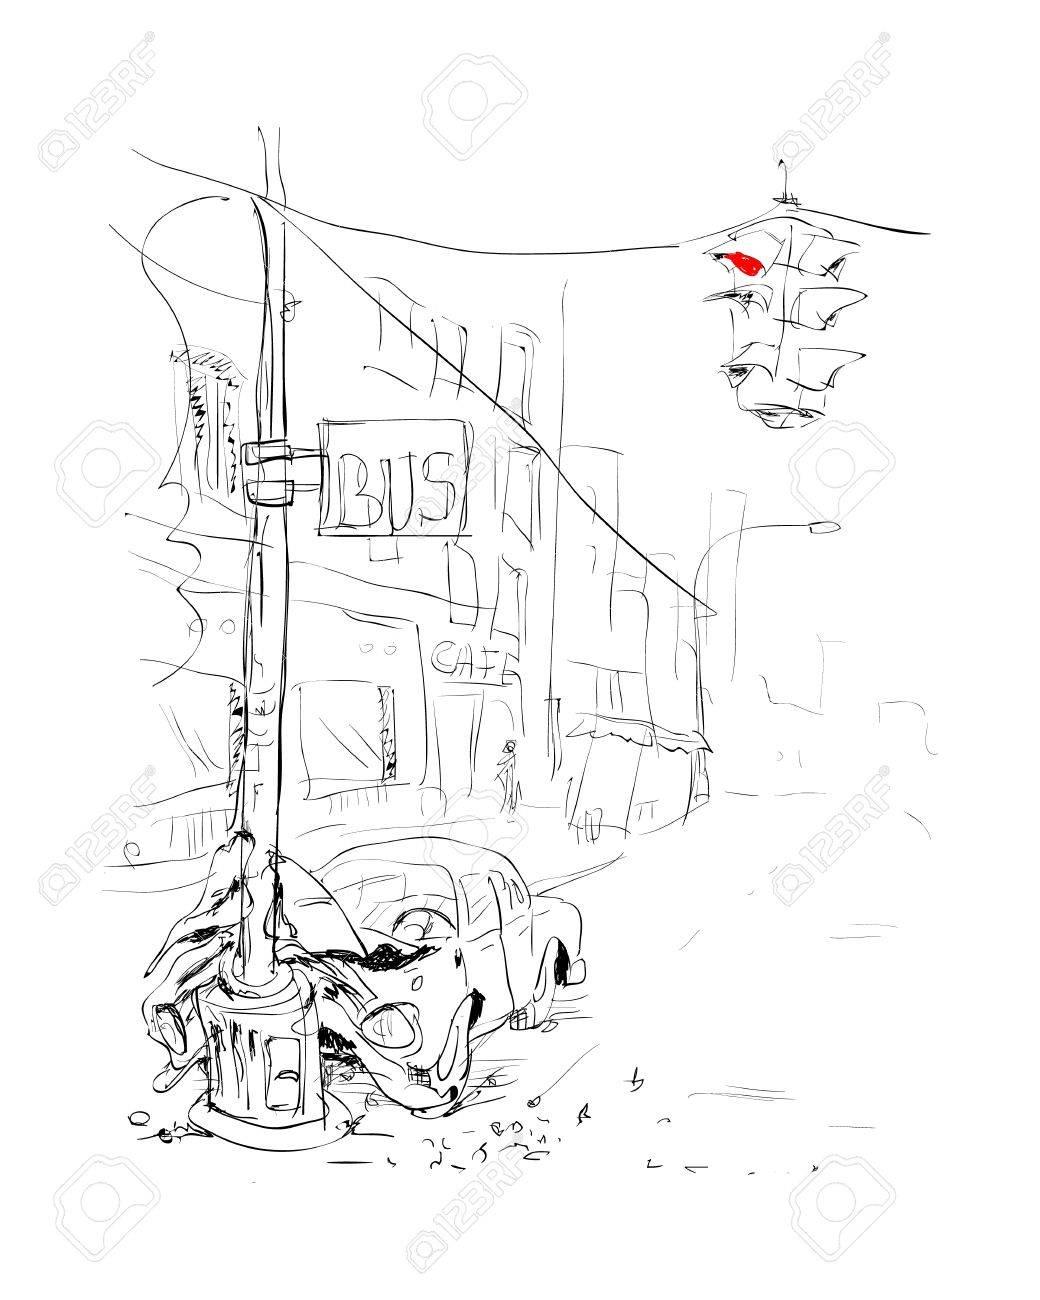 Car Accident Crash Illustration Royalty Free Cliparts, Vectors, And ...